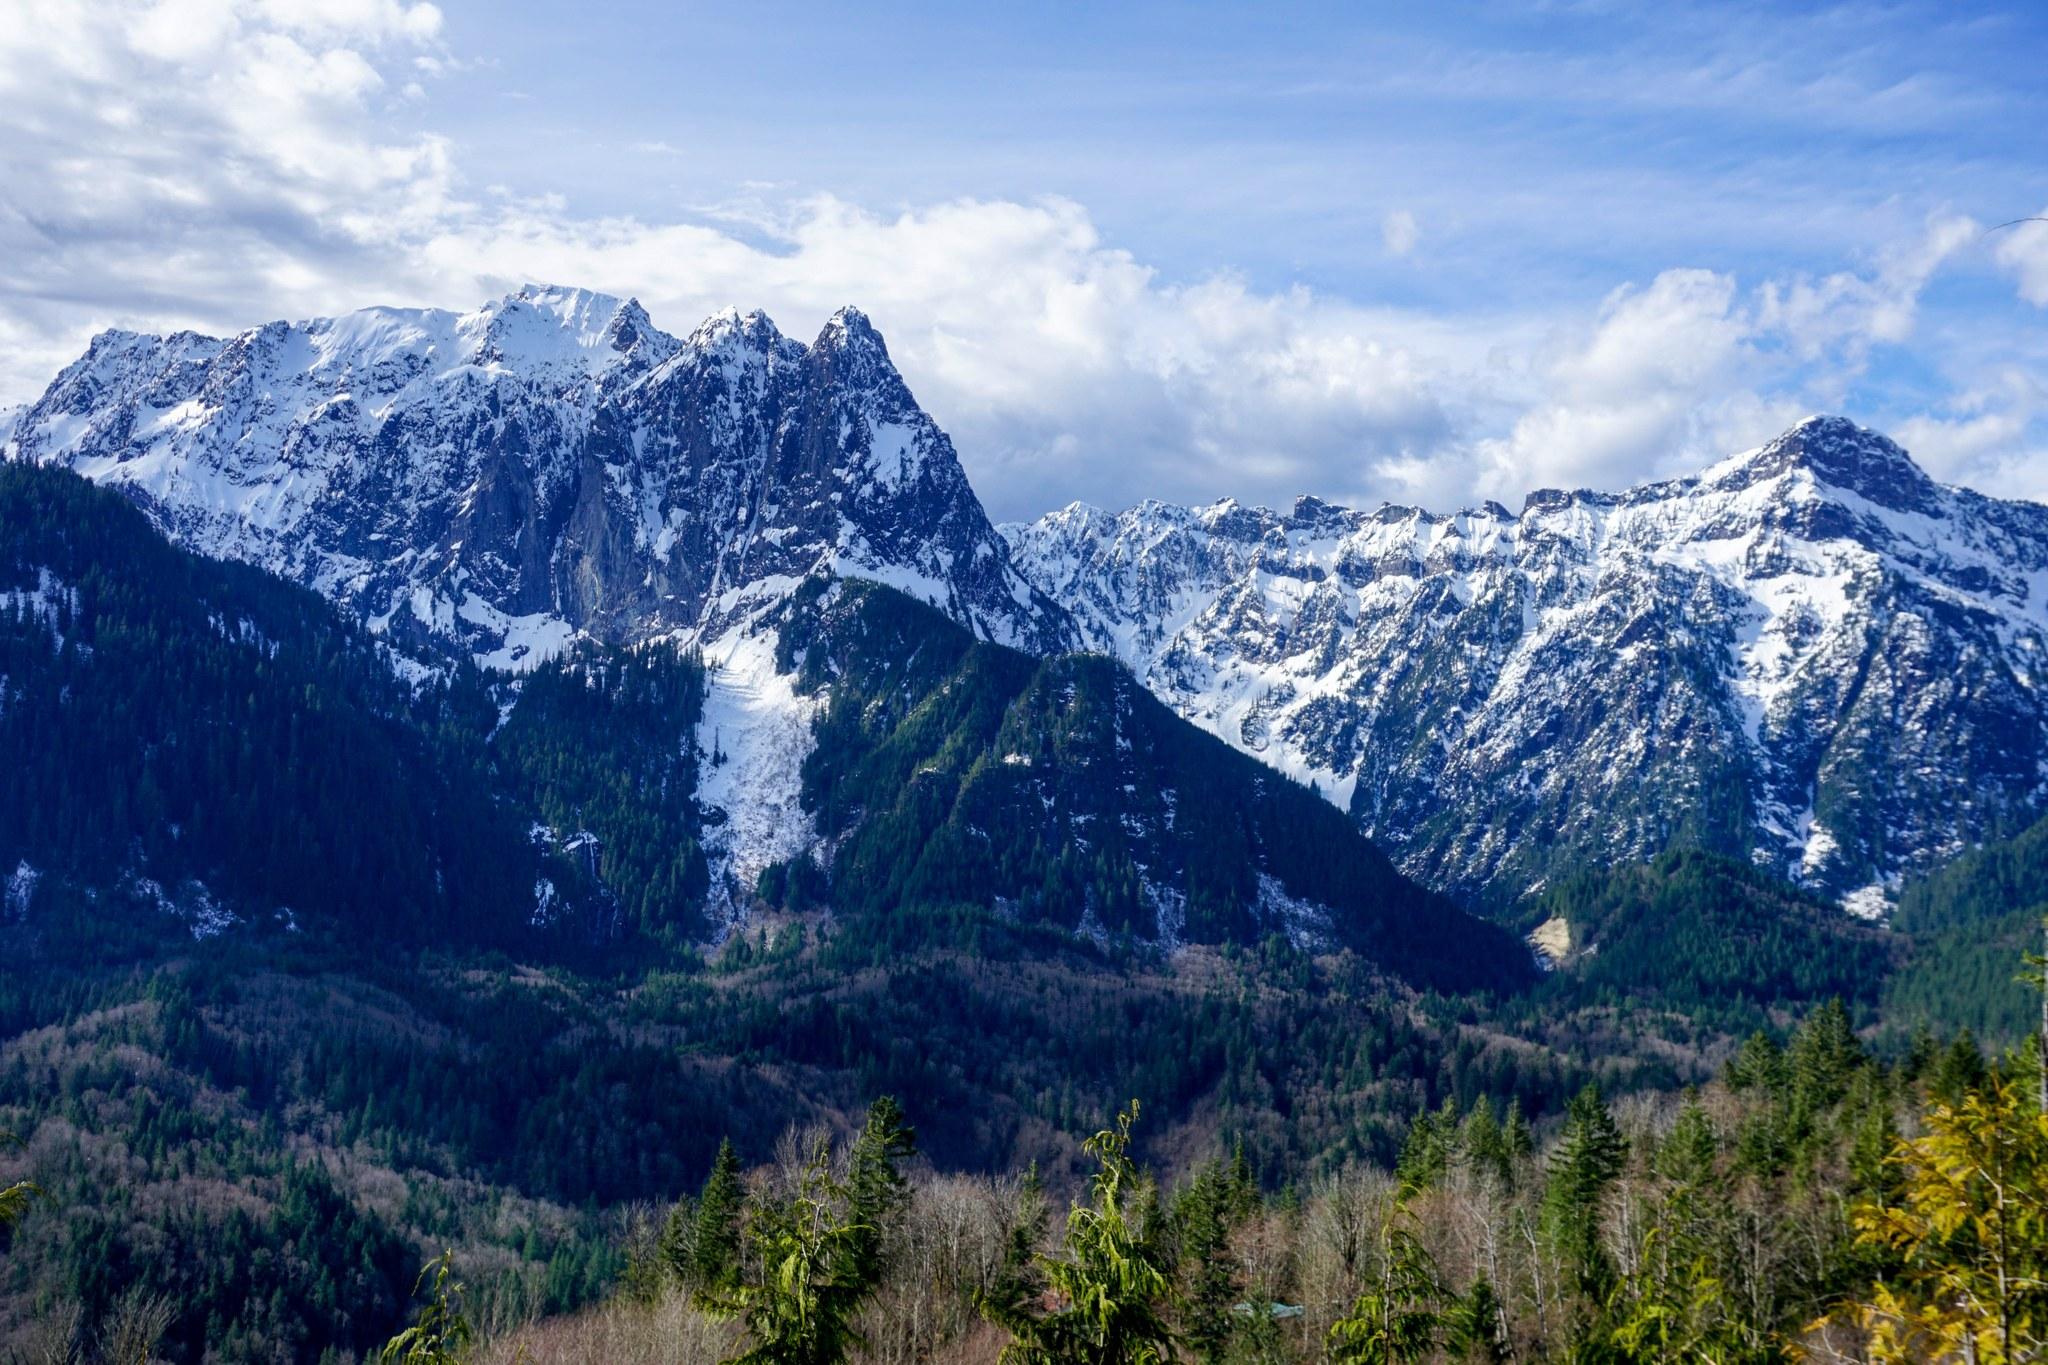 Heybrook Ridge by thenomadicartist.jpeg